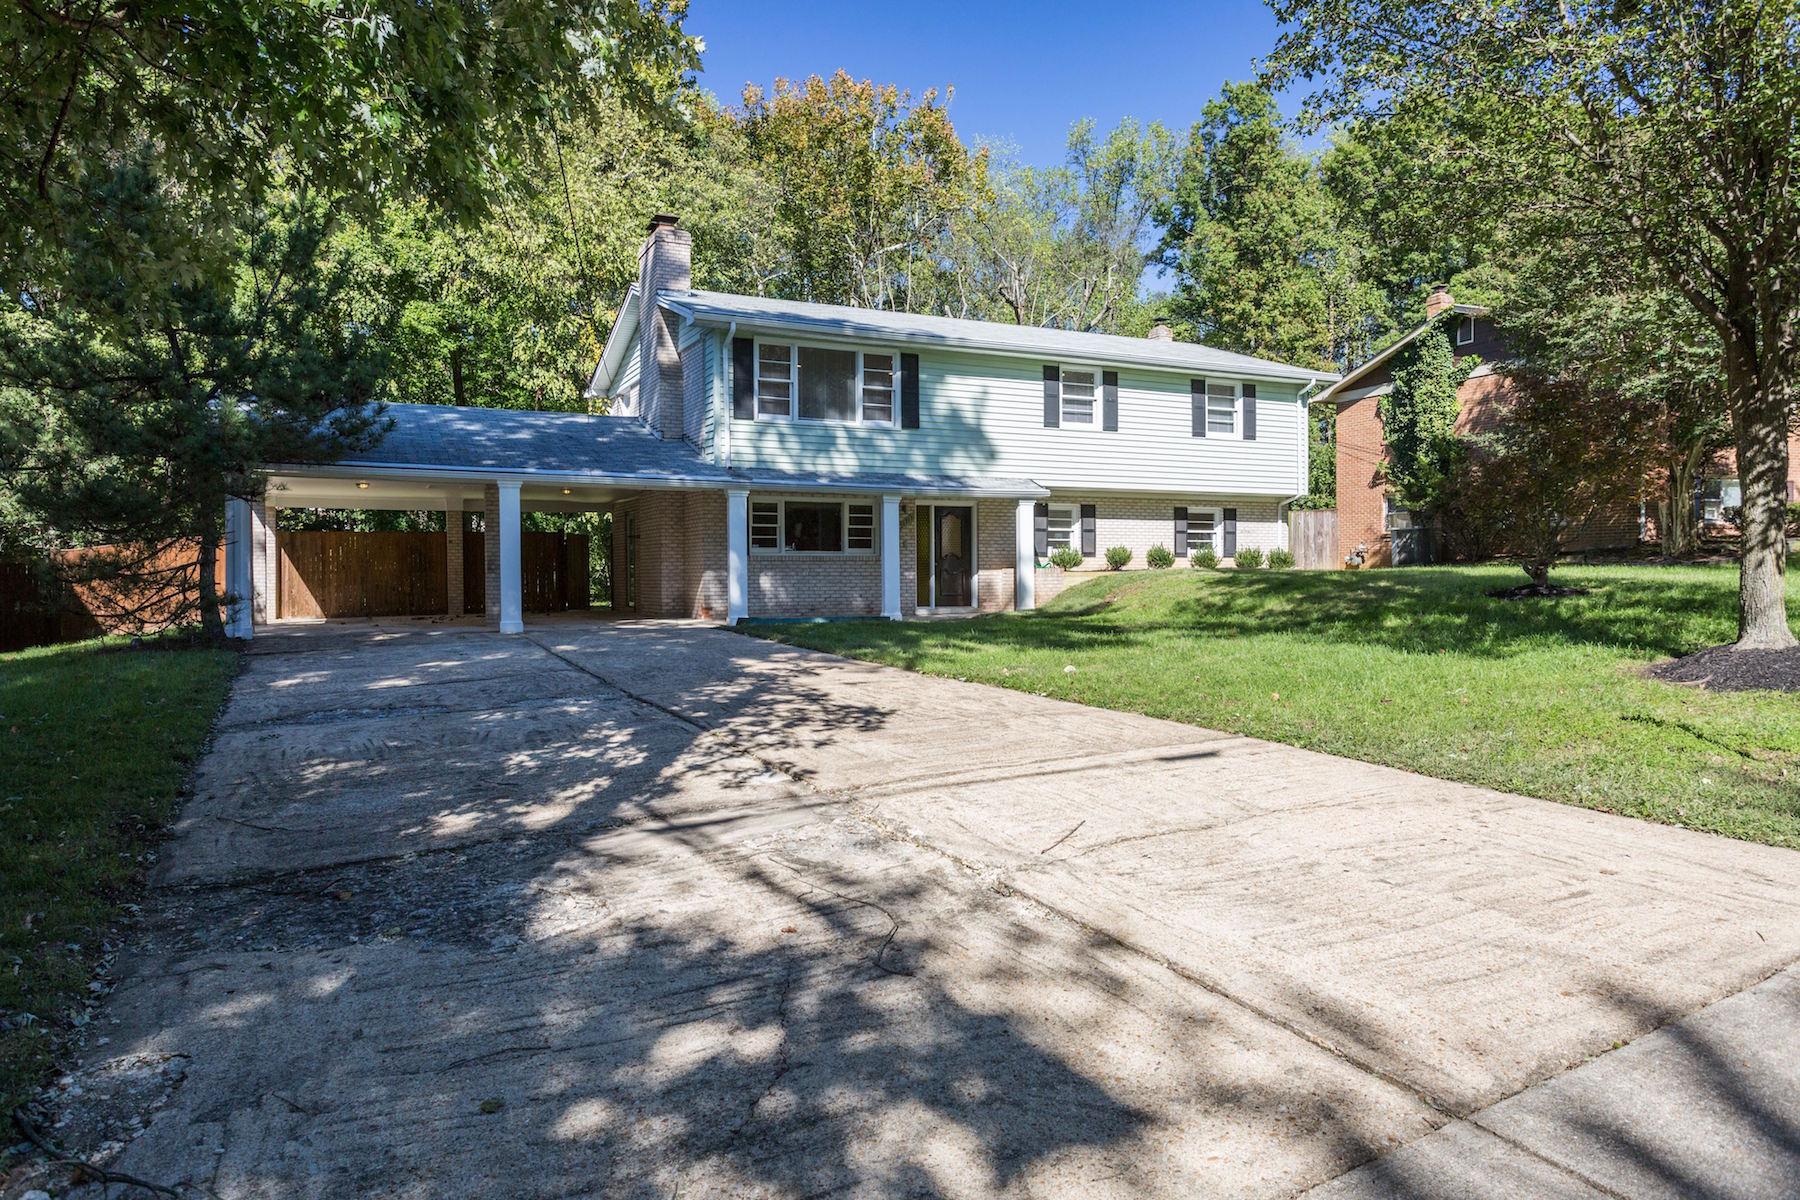 Single Family Home for Sale at Fort Washington 1717 Rhodesia Avenue E Fort Washington, Maryland, 20744 United States